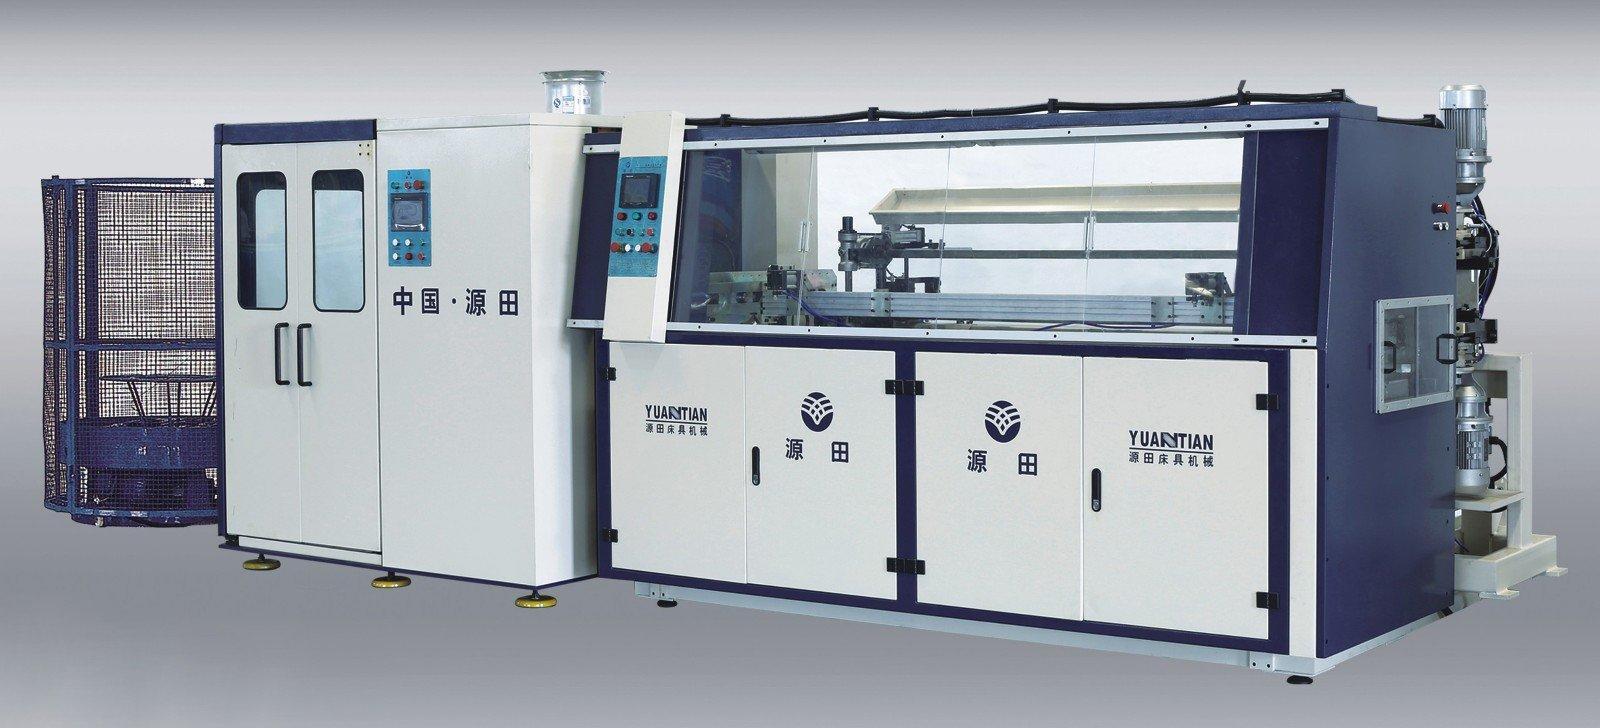 coiler automatic bonnell spring machine YUANTIAN Mattress Machines manufacture